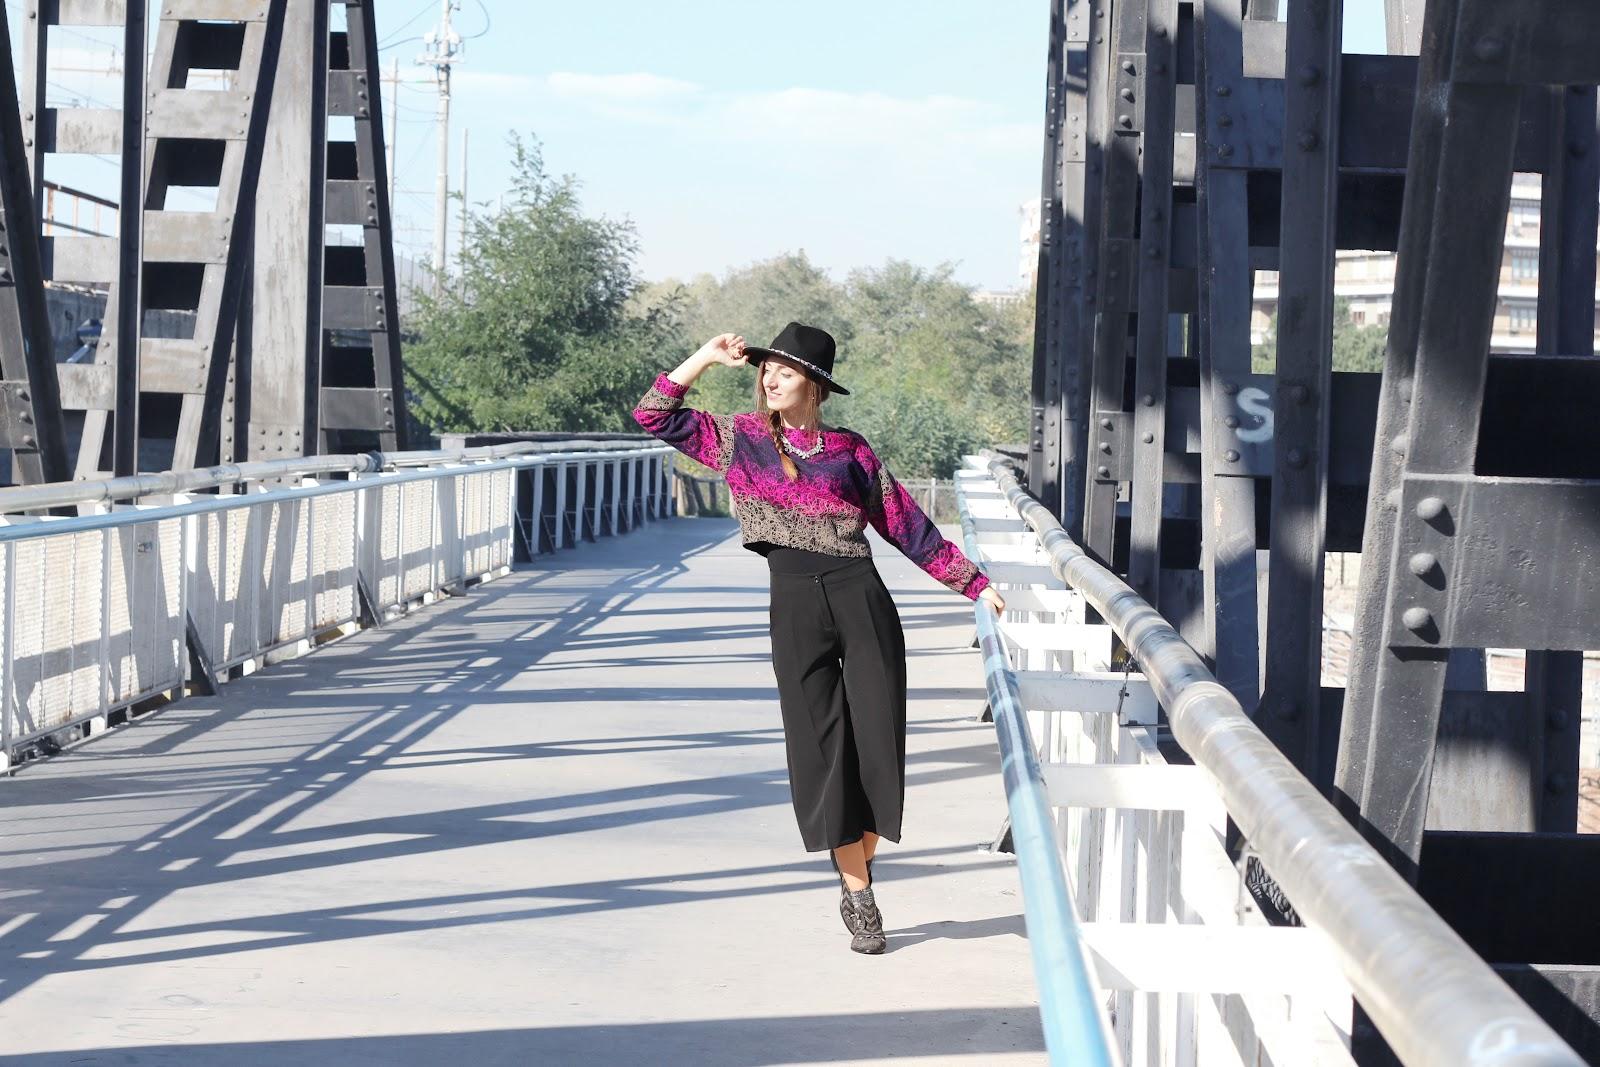 fashion blogger pescara italy italia outfit ootd style vogue fratelli rossetti shoes scarpe derby dandy goa goa happiness boutique zara bag borsa nera black hat